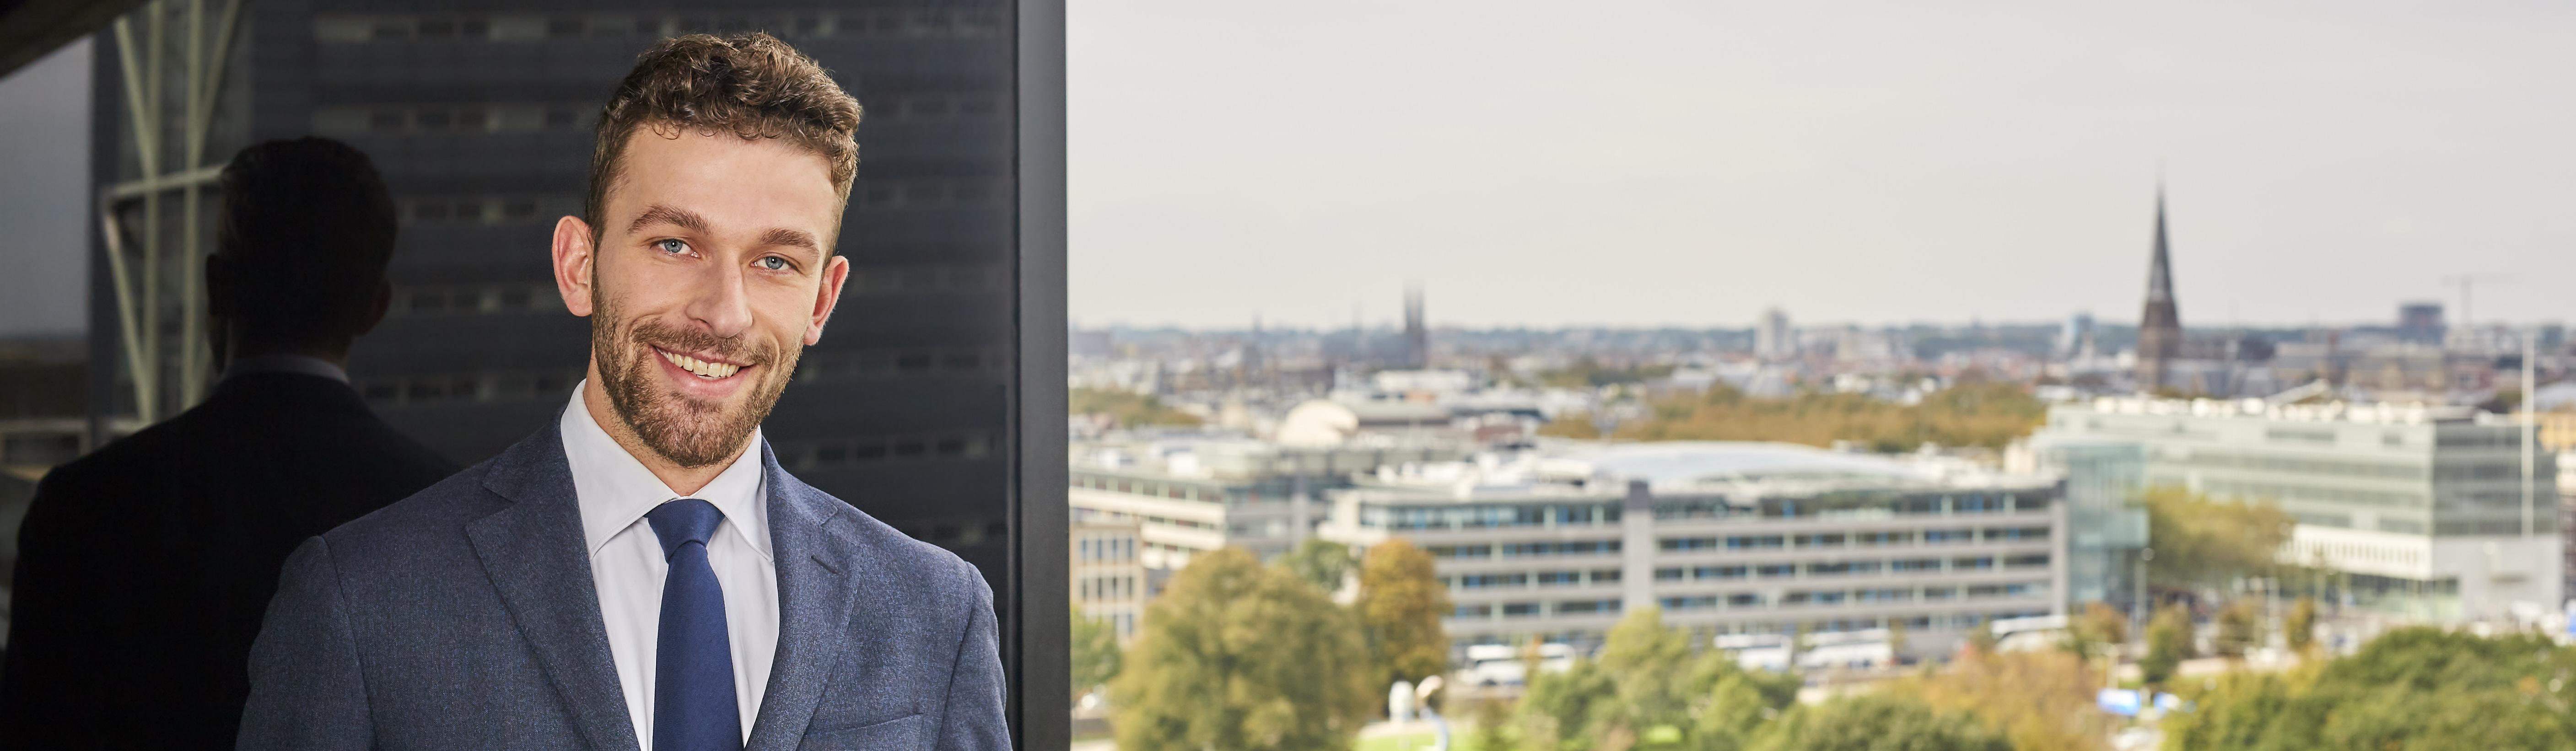 Raf Vermolen, advocaat Pels Rijcken